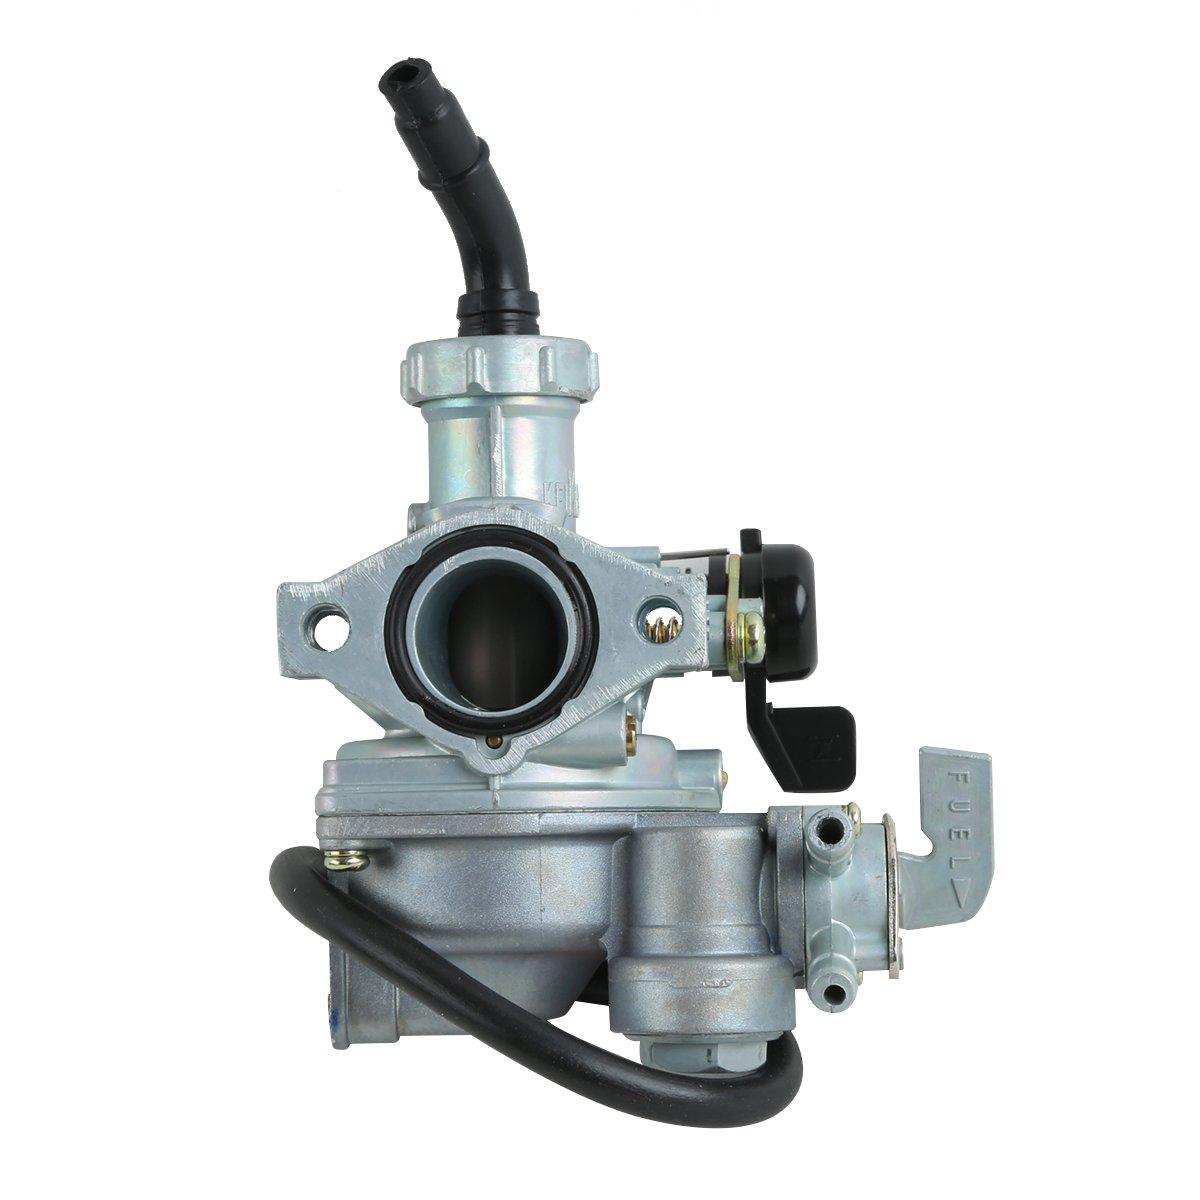 XMT-MOTO Replacement Carburetor Carb For HONDA ALL-TERRAIN VEHICLE (ATV) TRX 125 FOURTRAX 1985-1986(Replaces:16100-459-024, 16100-459-771, 16100-459-772,16101-459-P00, 16100-459-712, 16100-459-713)